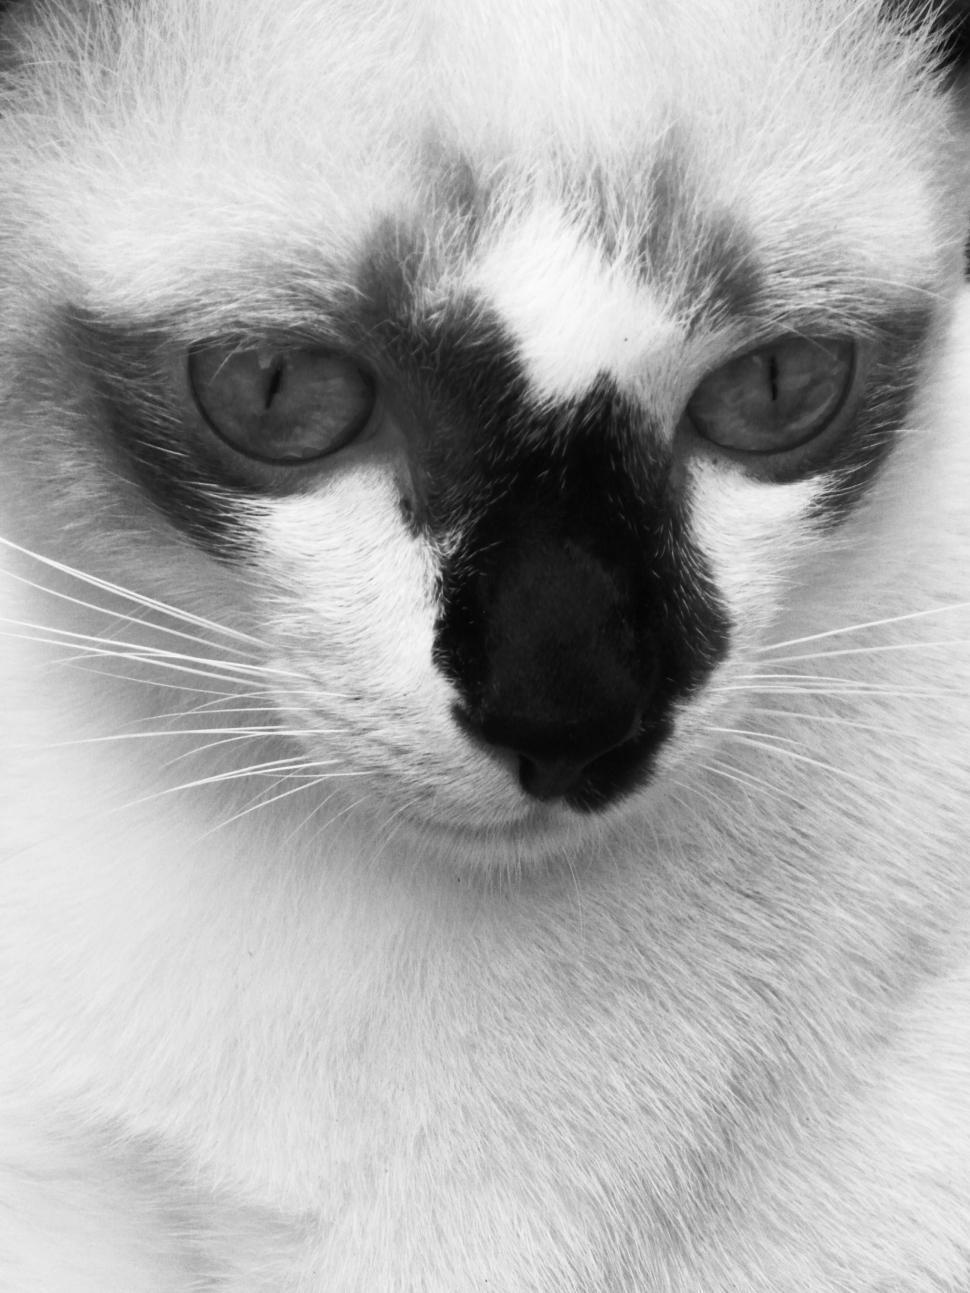 Download Free Stock Photo of Burmese Cat B&W